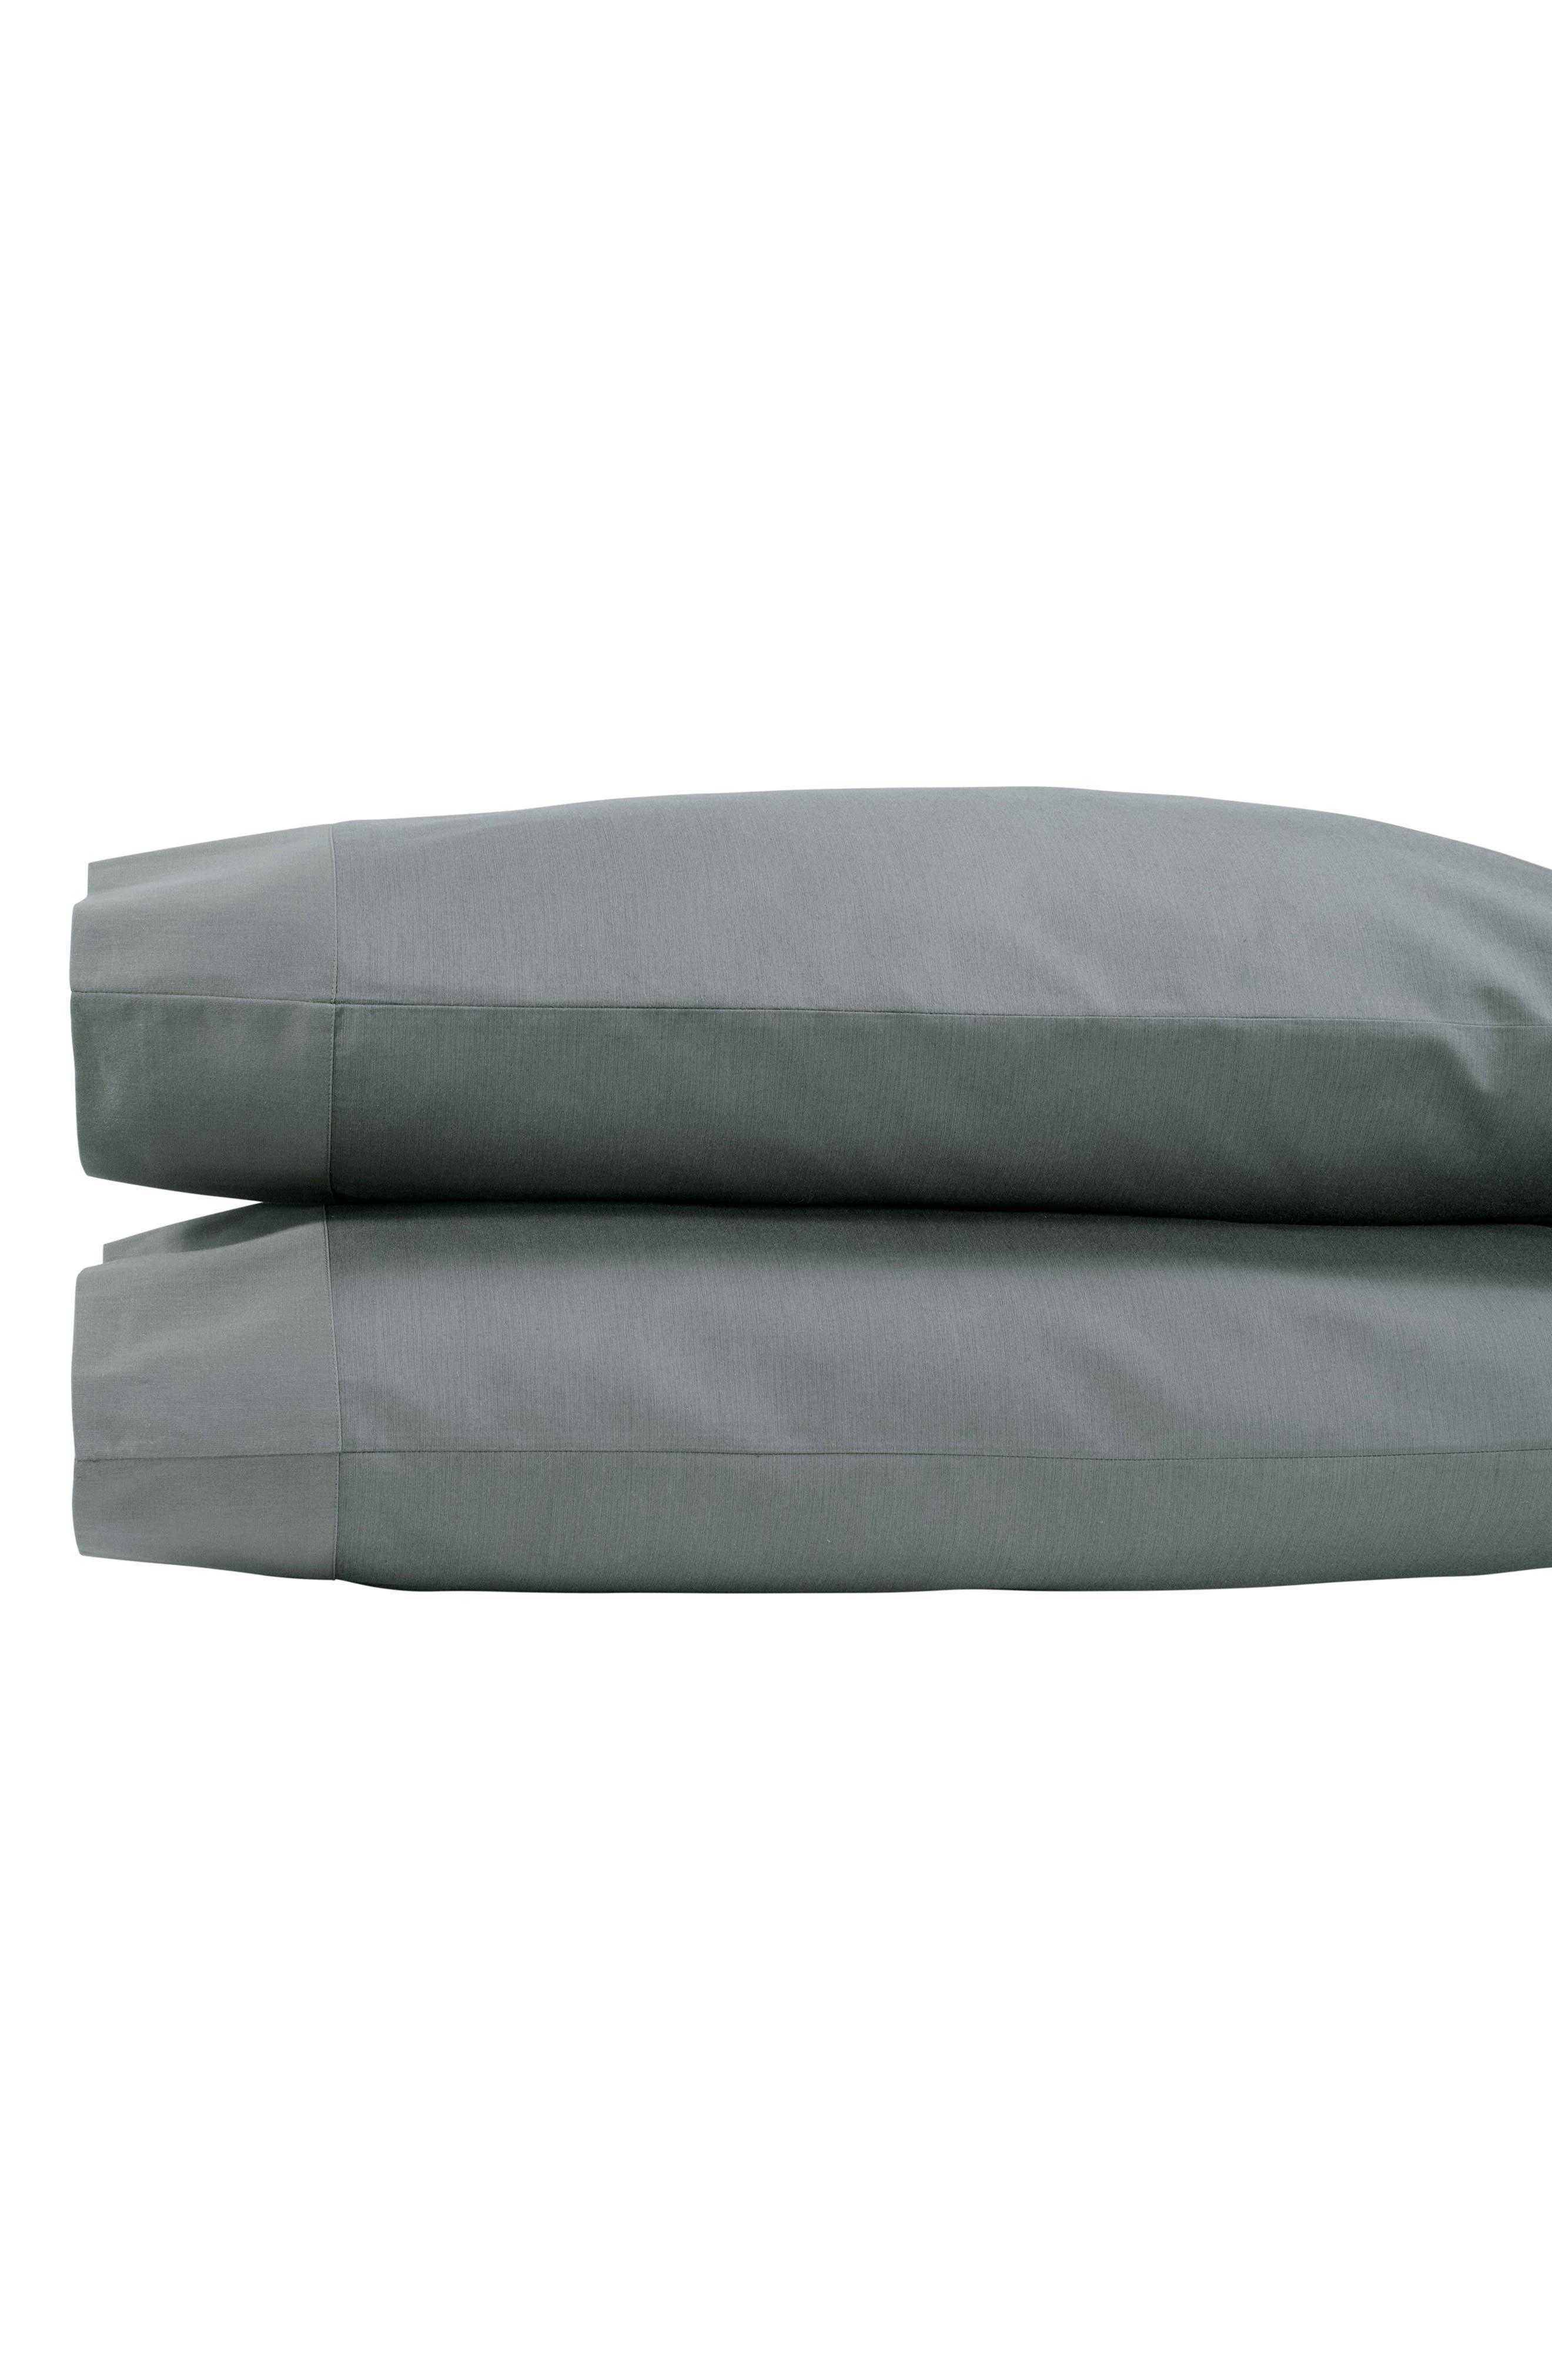 Michael Aram Striated Band 400 Thread Count Pillowcases